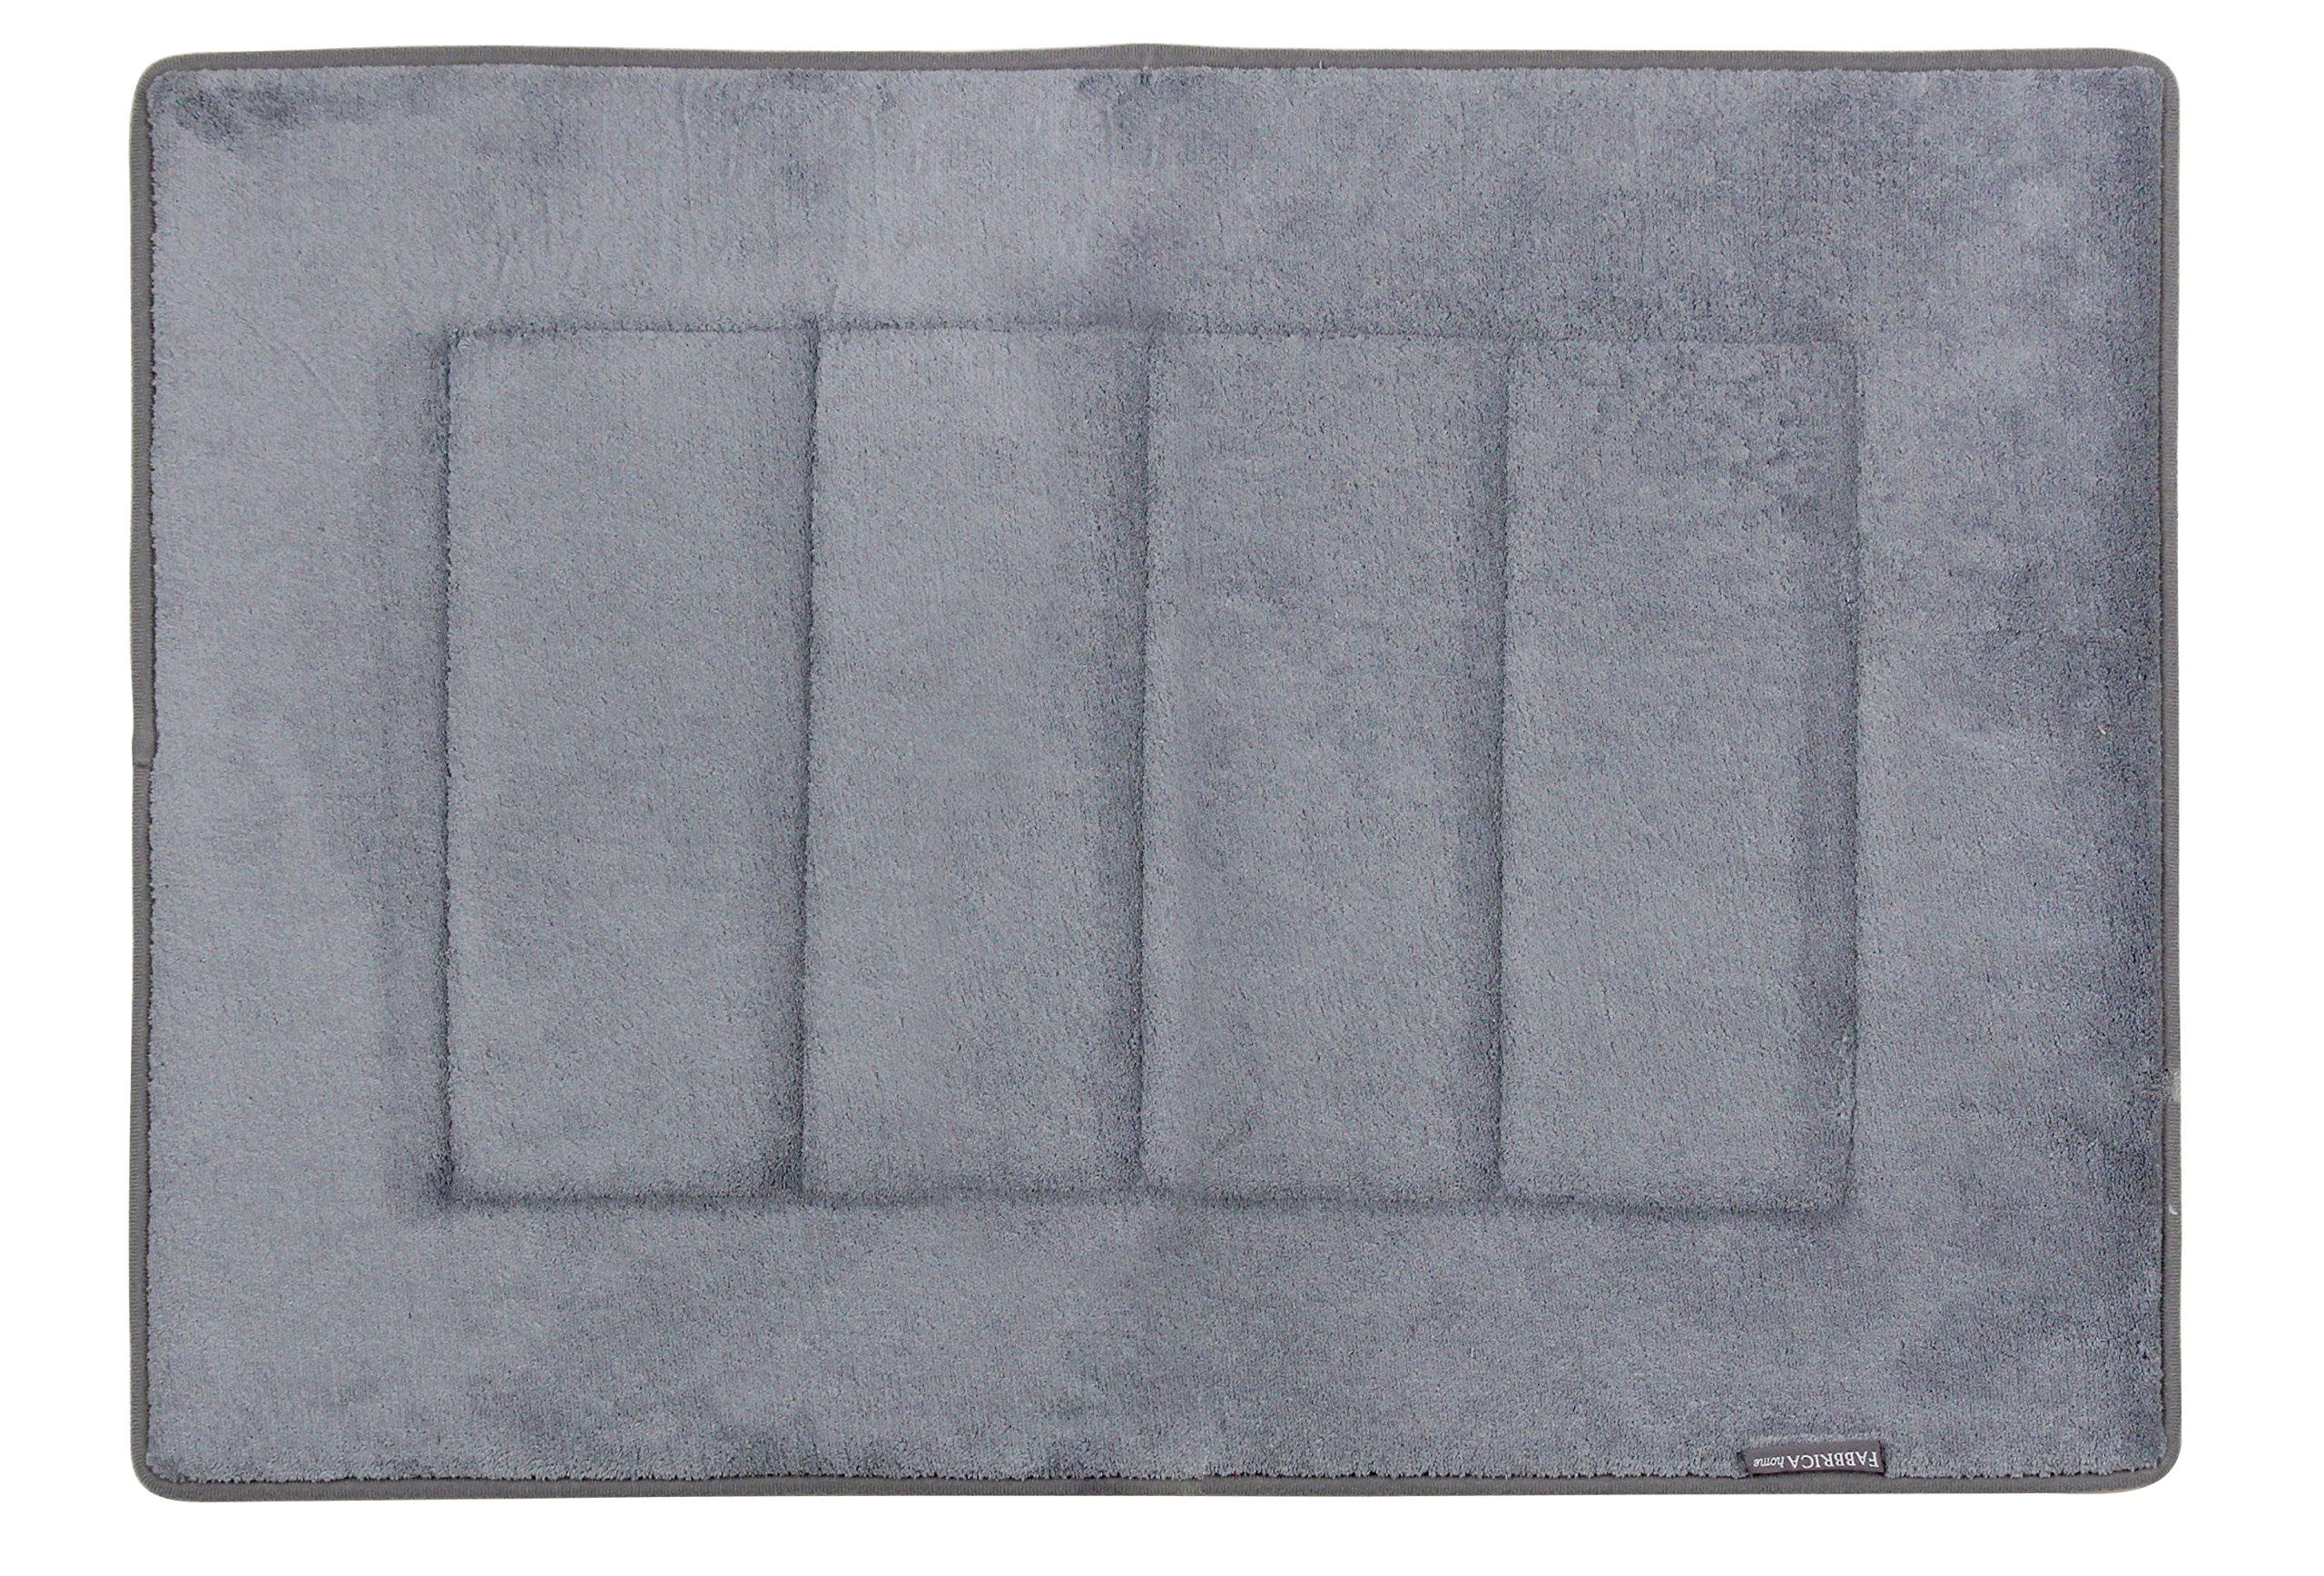 Fabbrica Home Ultra-Soft HD Memory Foam Bath Mat (17 in. x 24 in.) (Slate Gray)